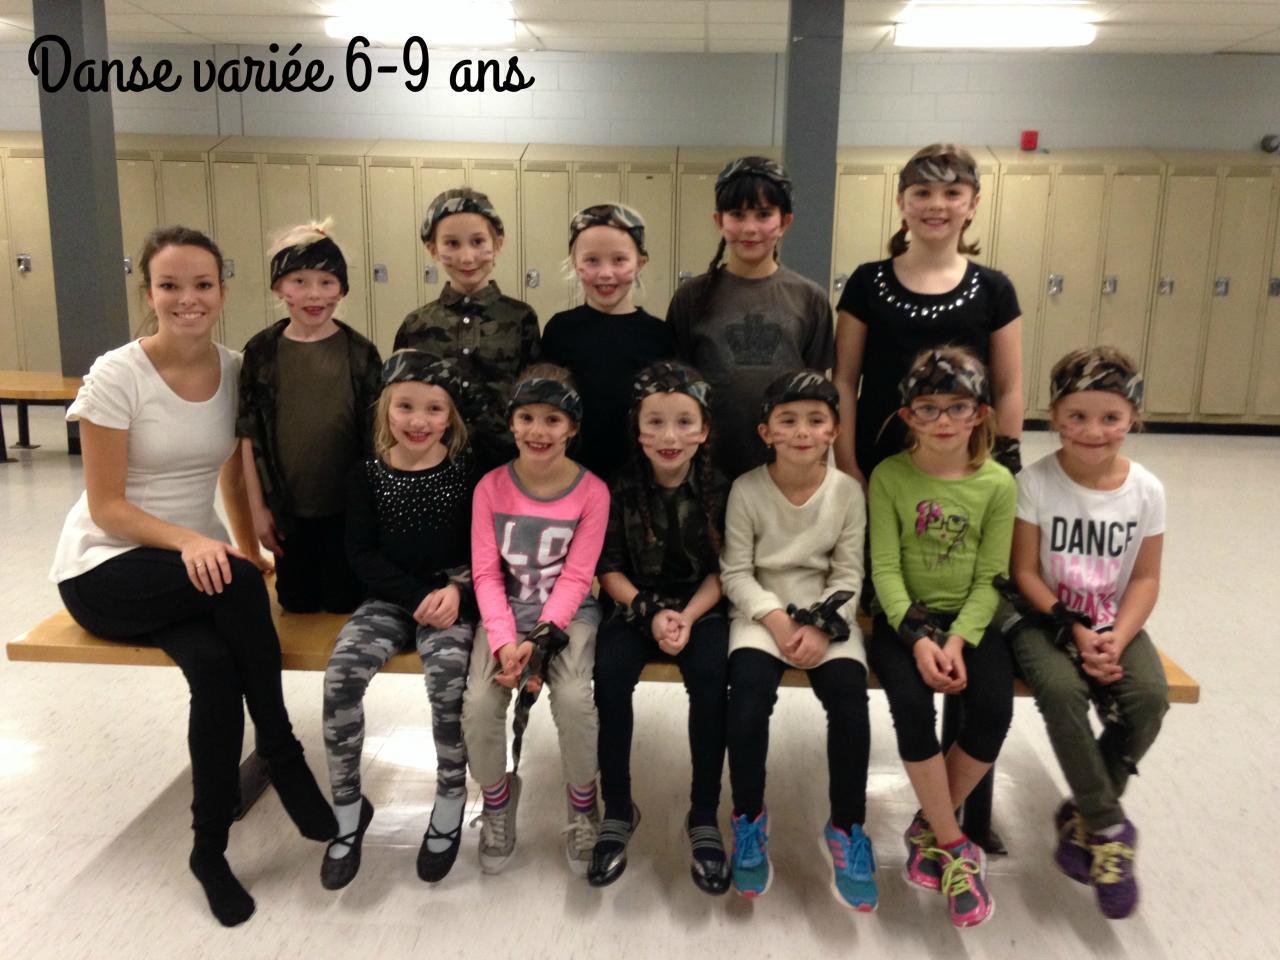 Danse varieé 6-9 ans